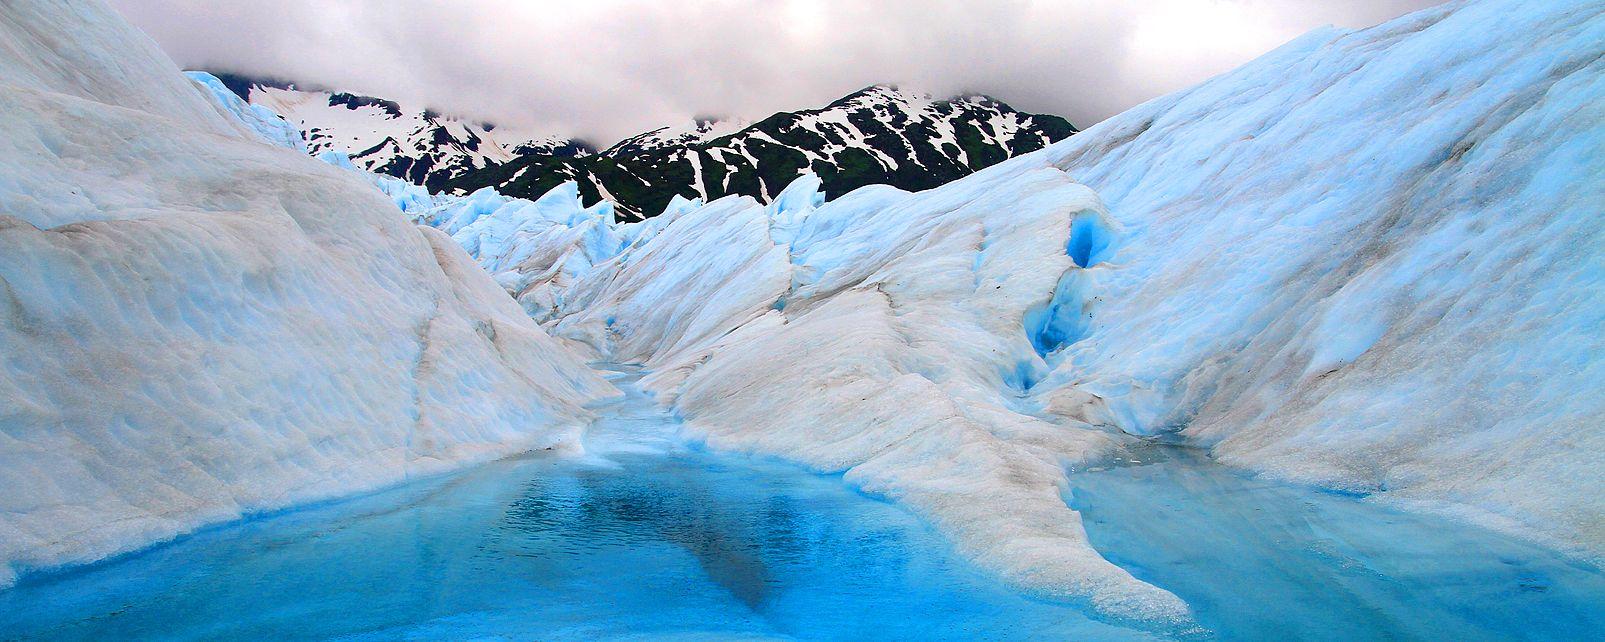 Mendenhall, Glacier, Juneau, Alaska, USA, etats-unis, glace, grotte